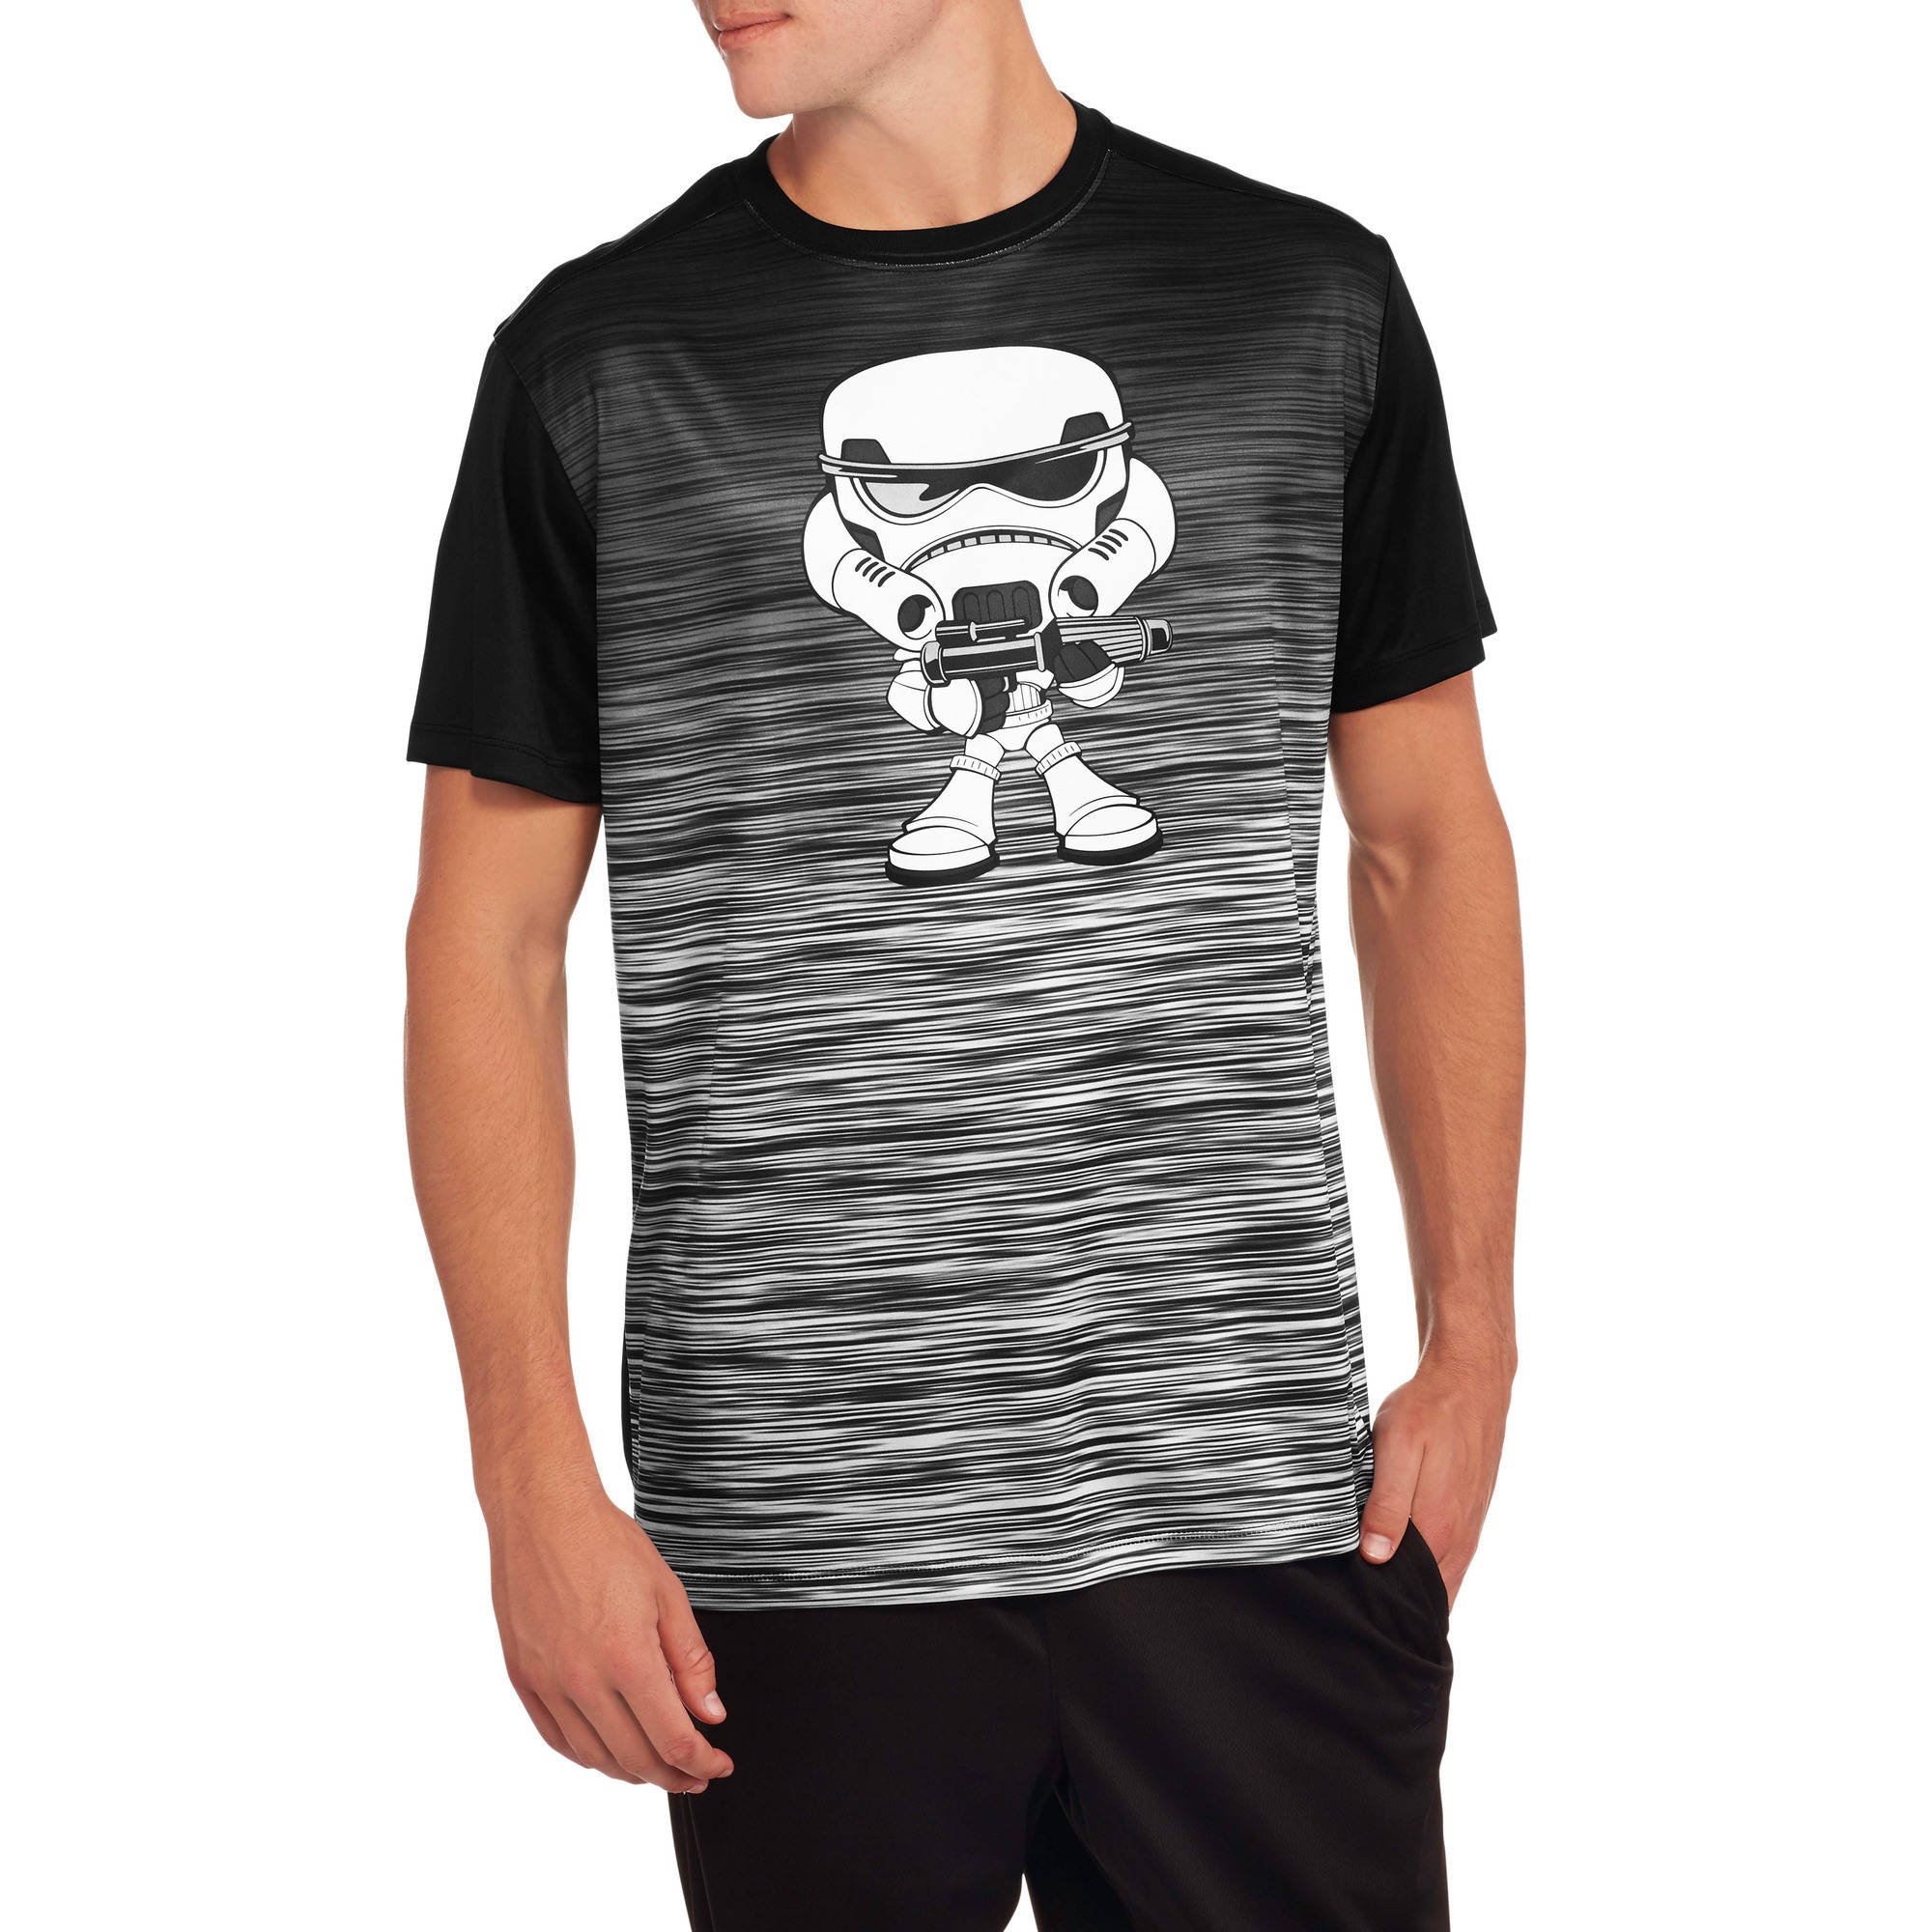 Star Wars Storm Trooper Kawaii Men's Graphic Poly Tee